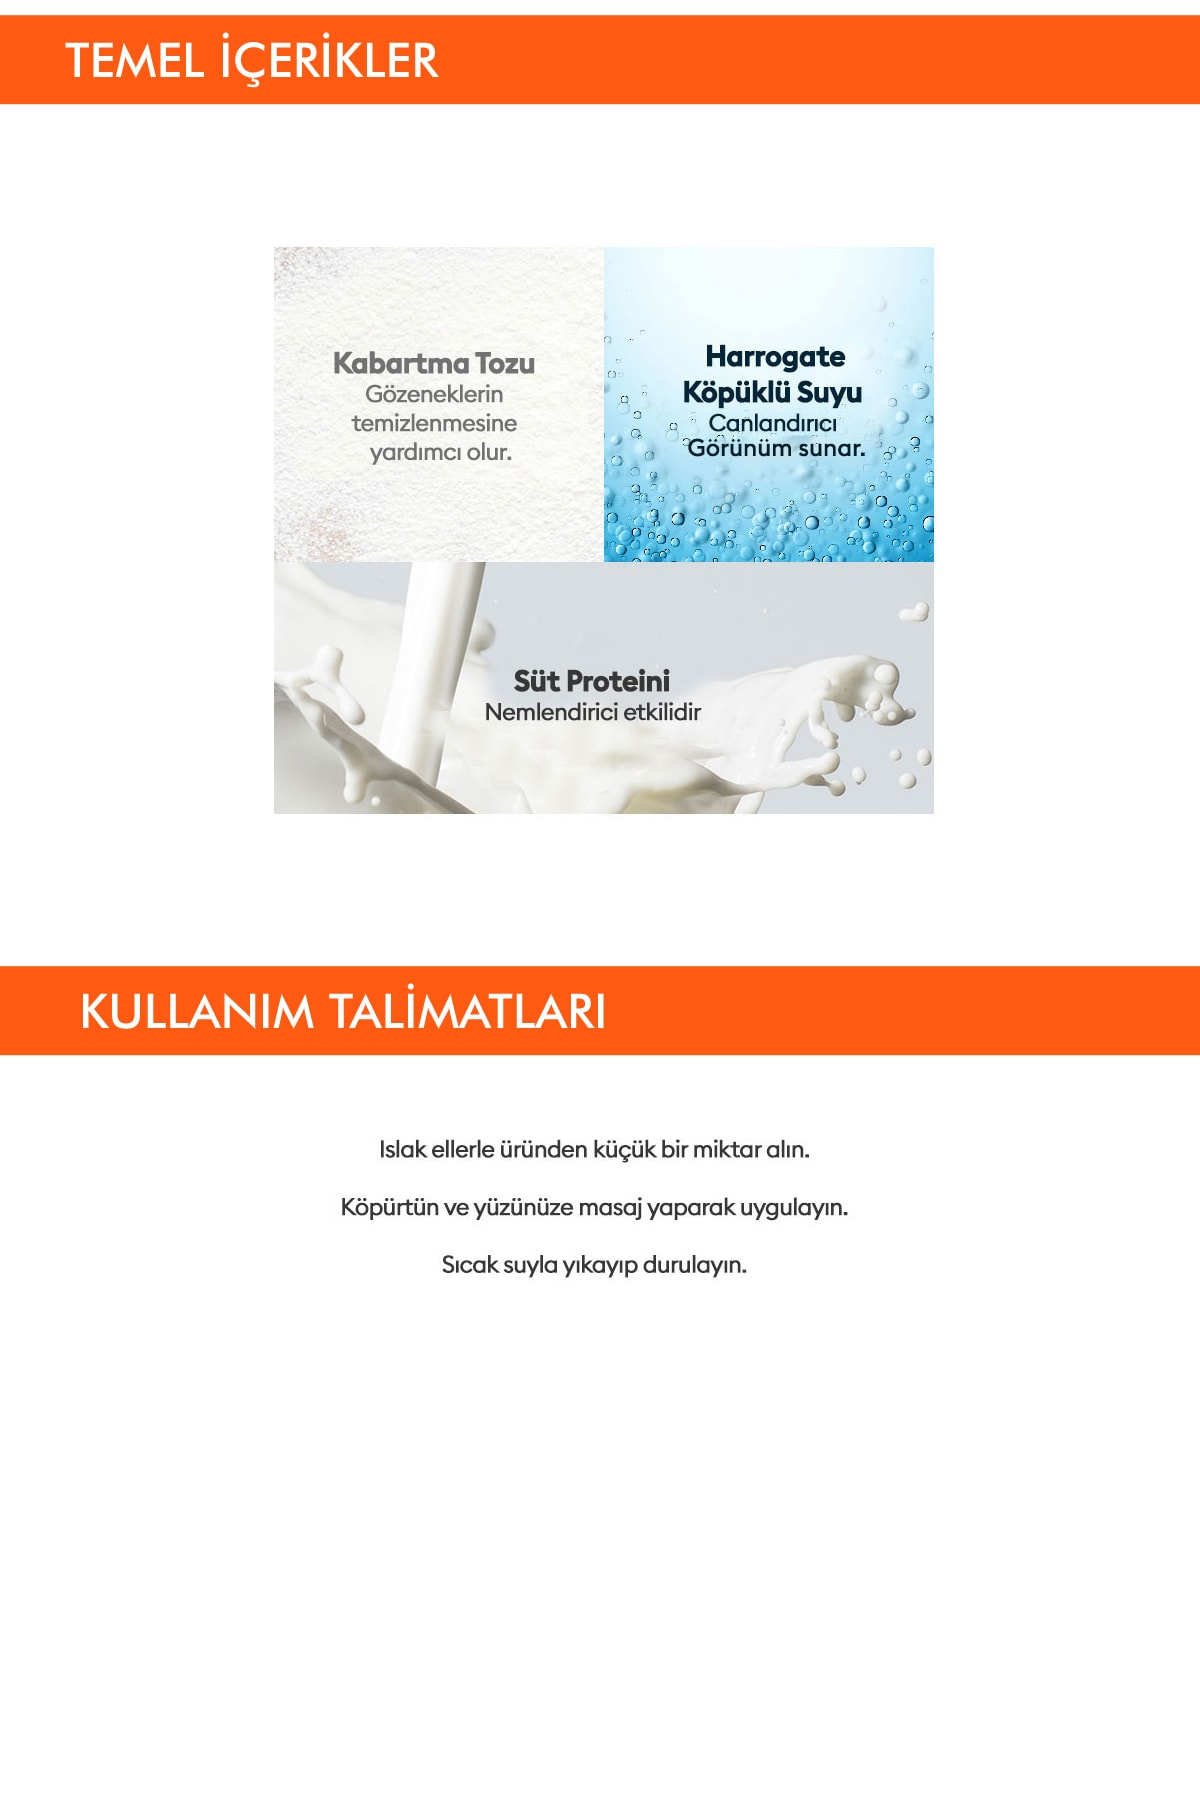 Missha Kremsi Köpük Yumuşak Yüz Yıkama Köpüğü 130ml APIEU Deep Clean Foam Cleanser (Whipping) 3